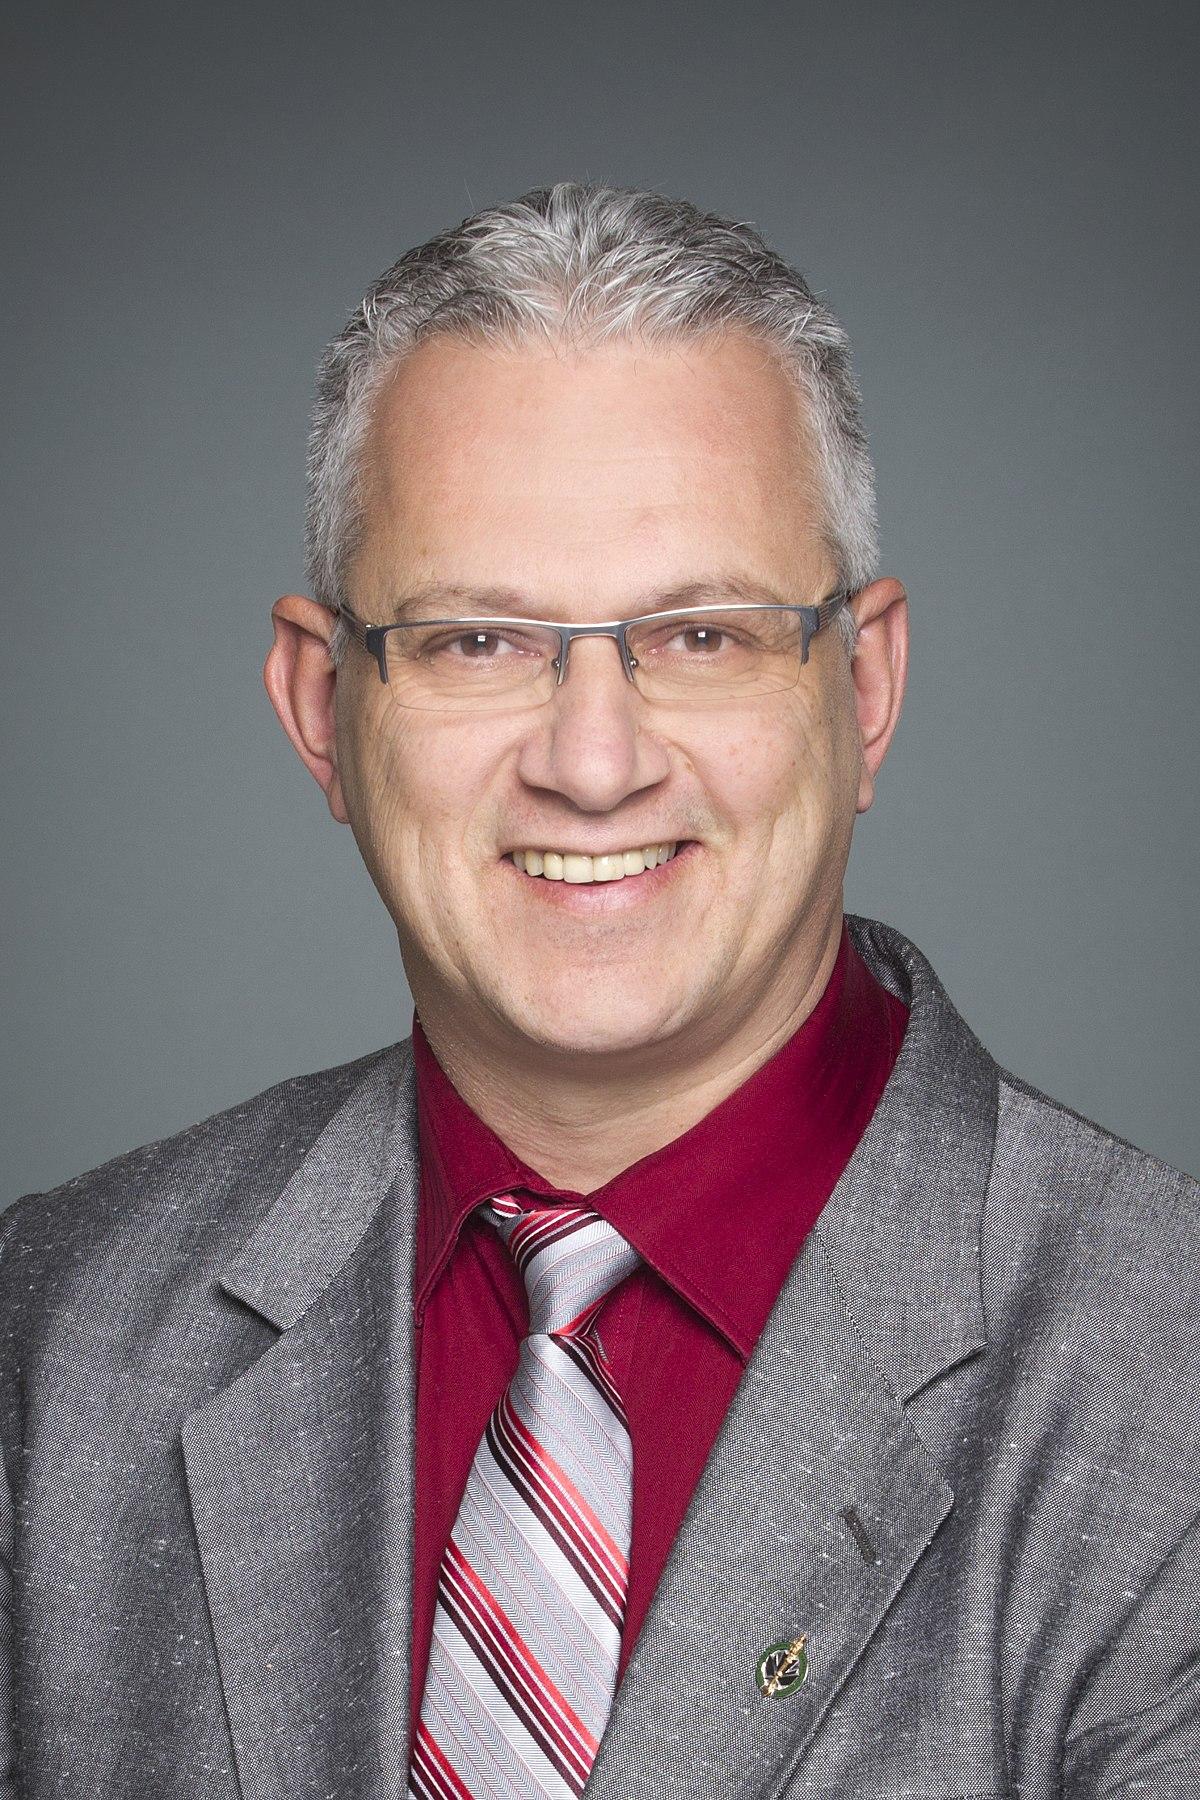 Canadian election Stéphane Lauzon - Wikipedia